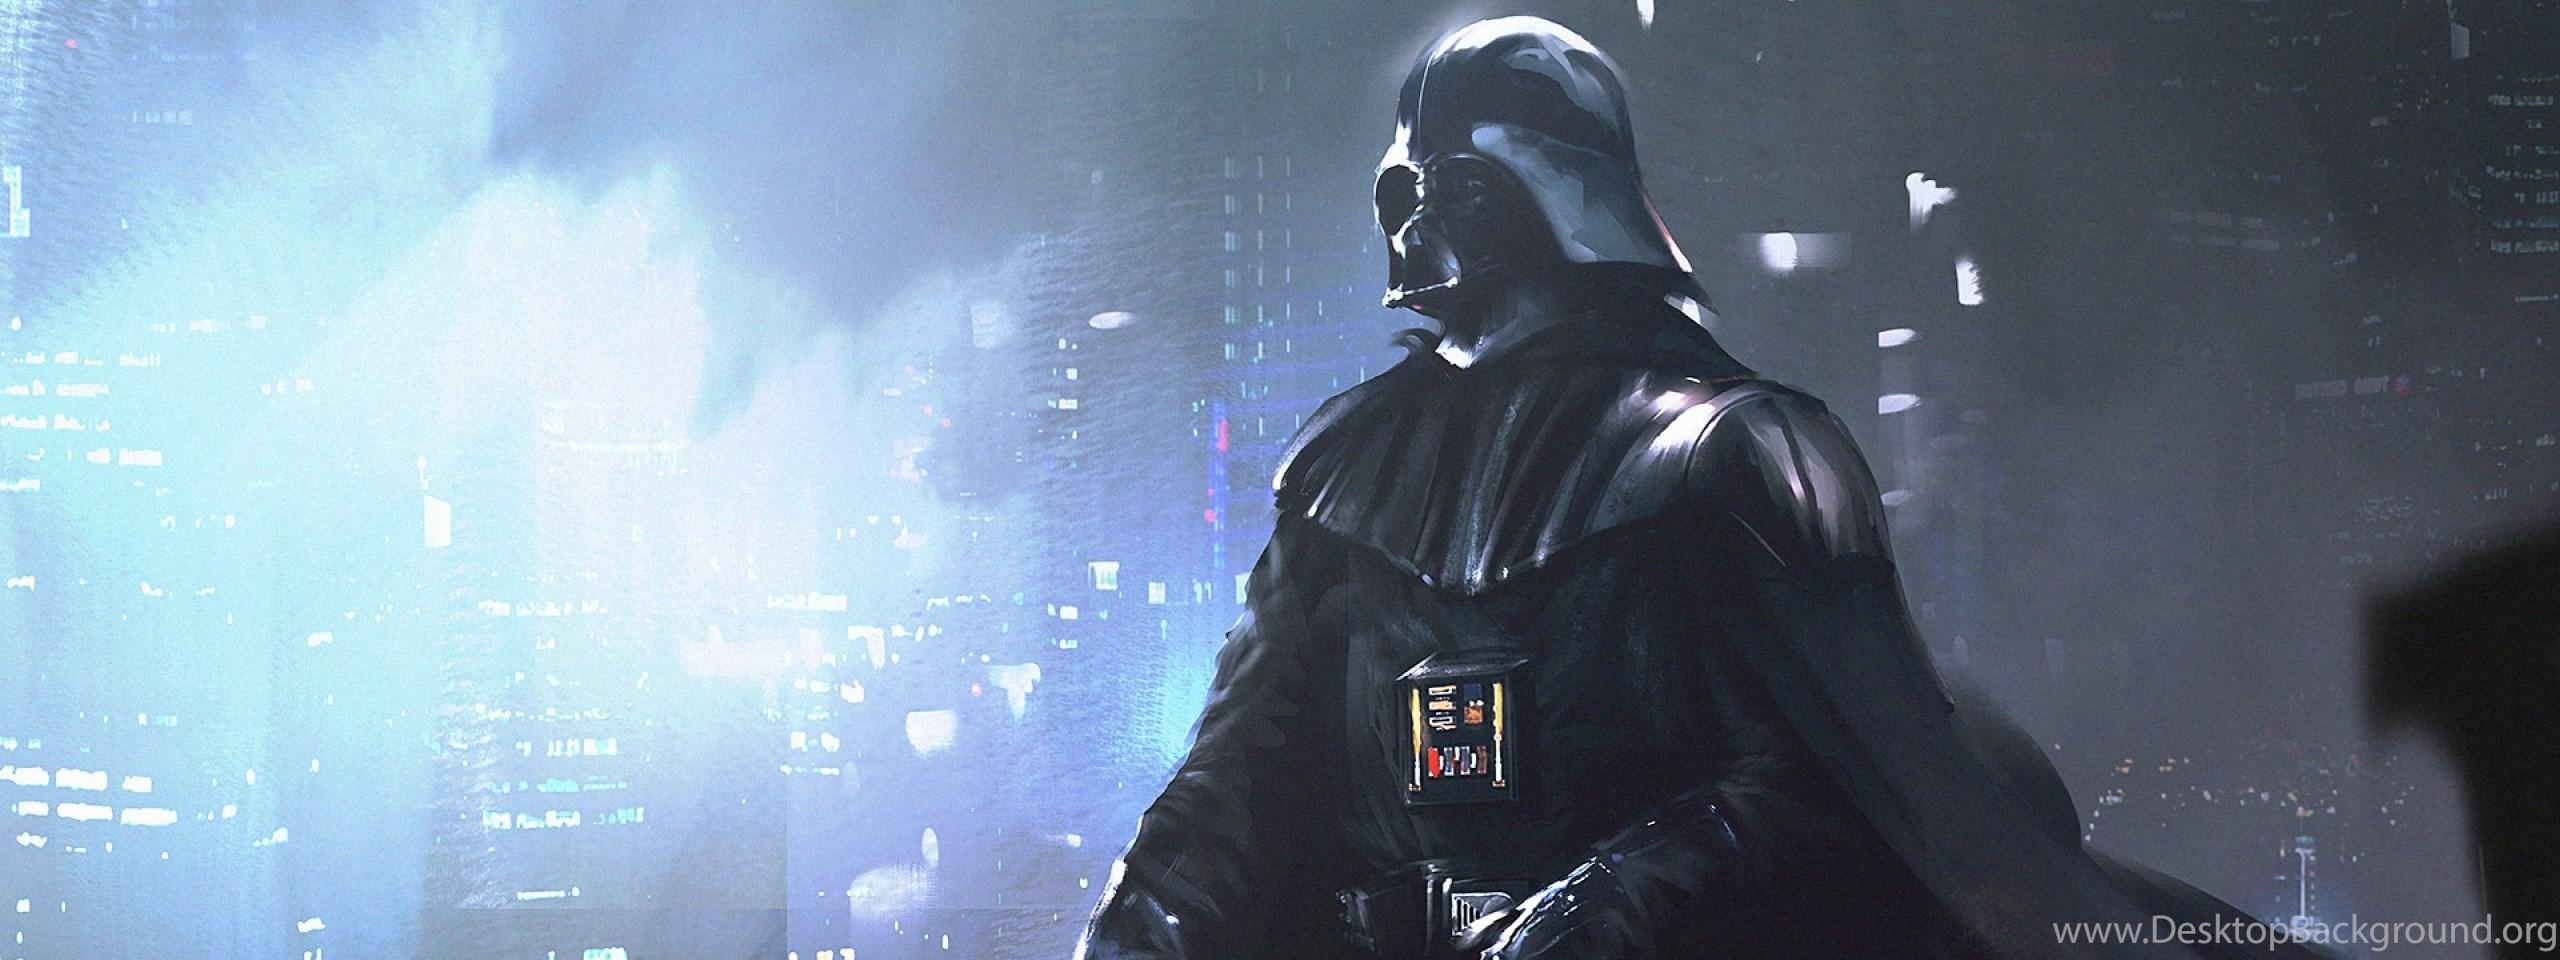 2560x1080 21 9 Tv Star Wars Wallpapers Hd Desktop Backgrounds